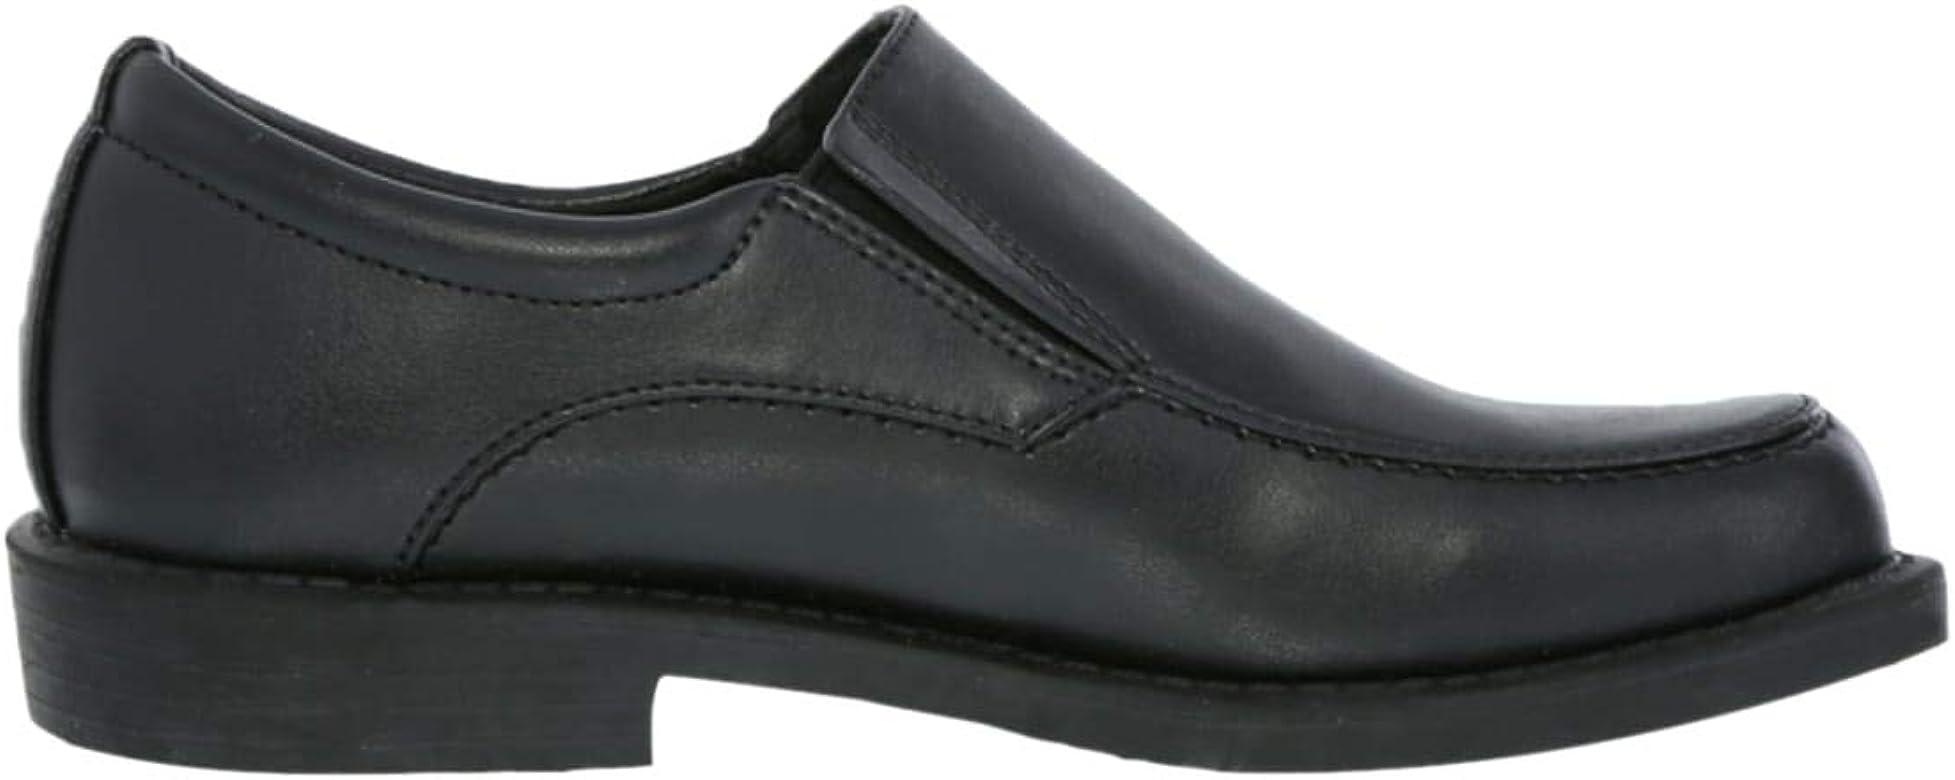 SmartFit Boys Dress Slip-On 067491-Parent